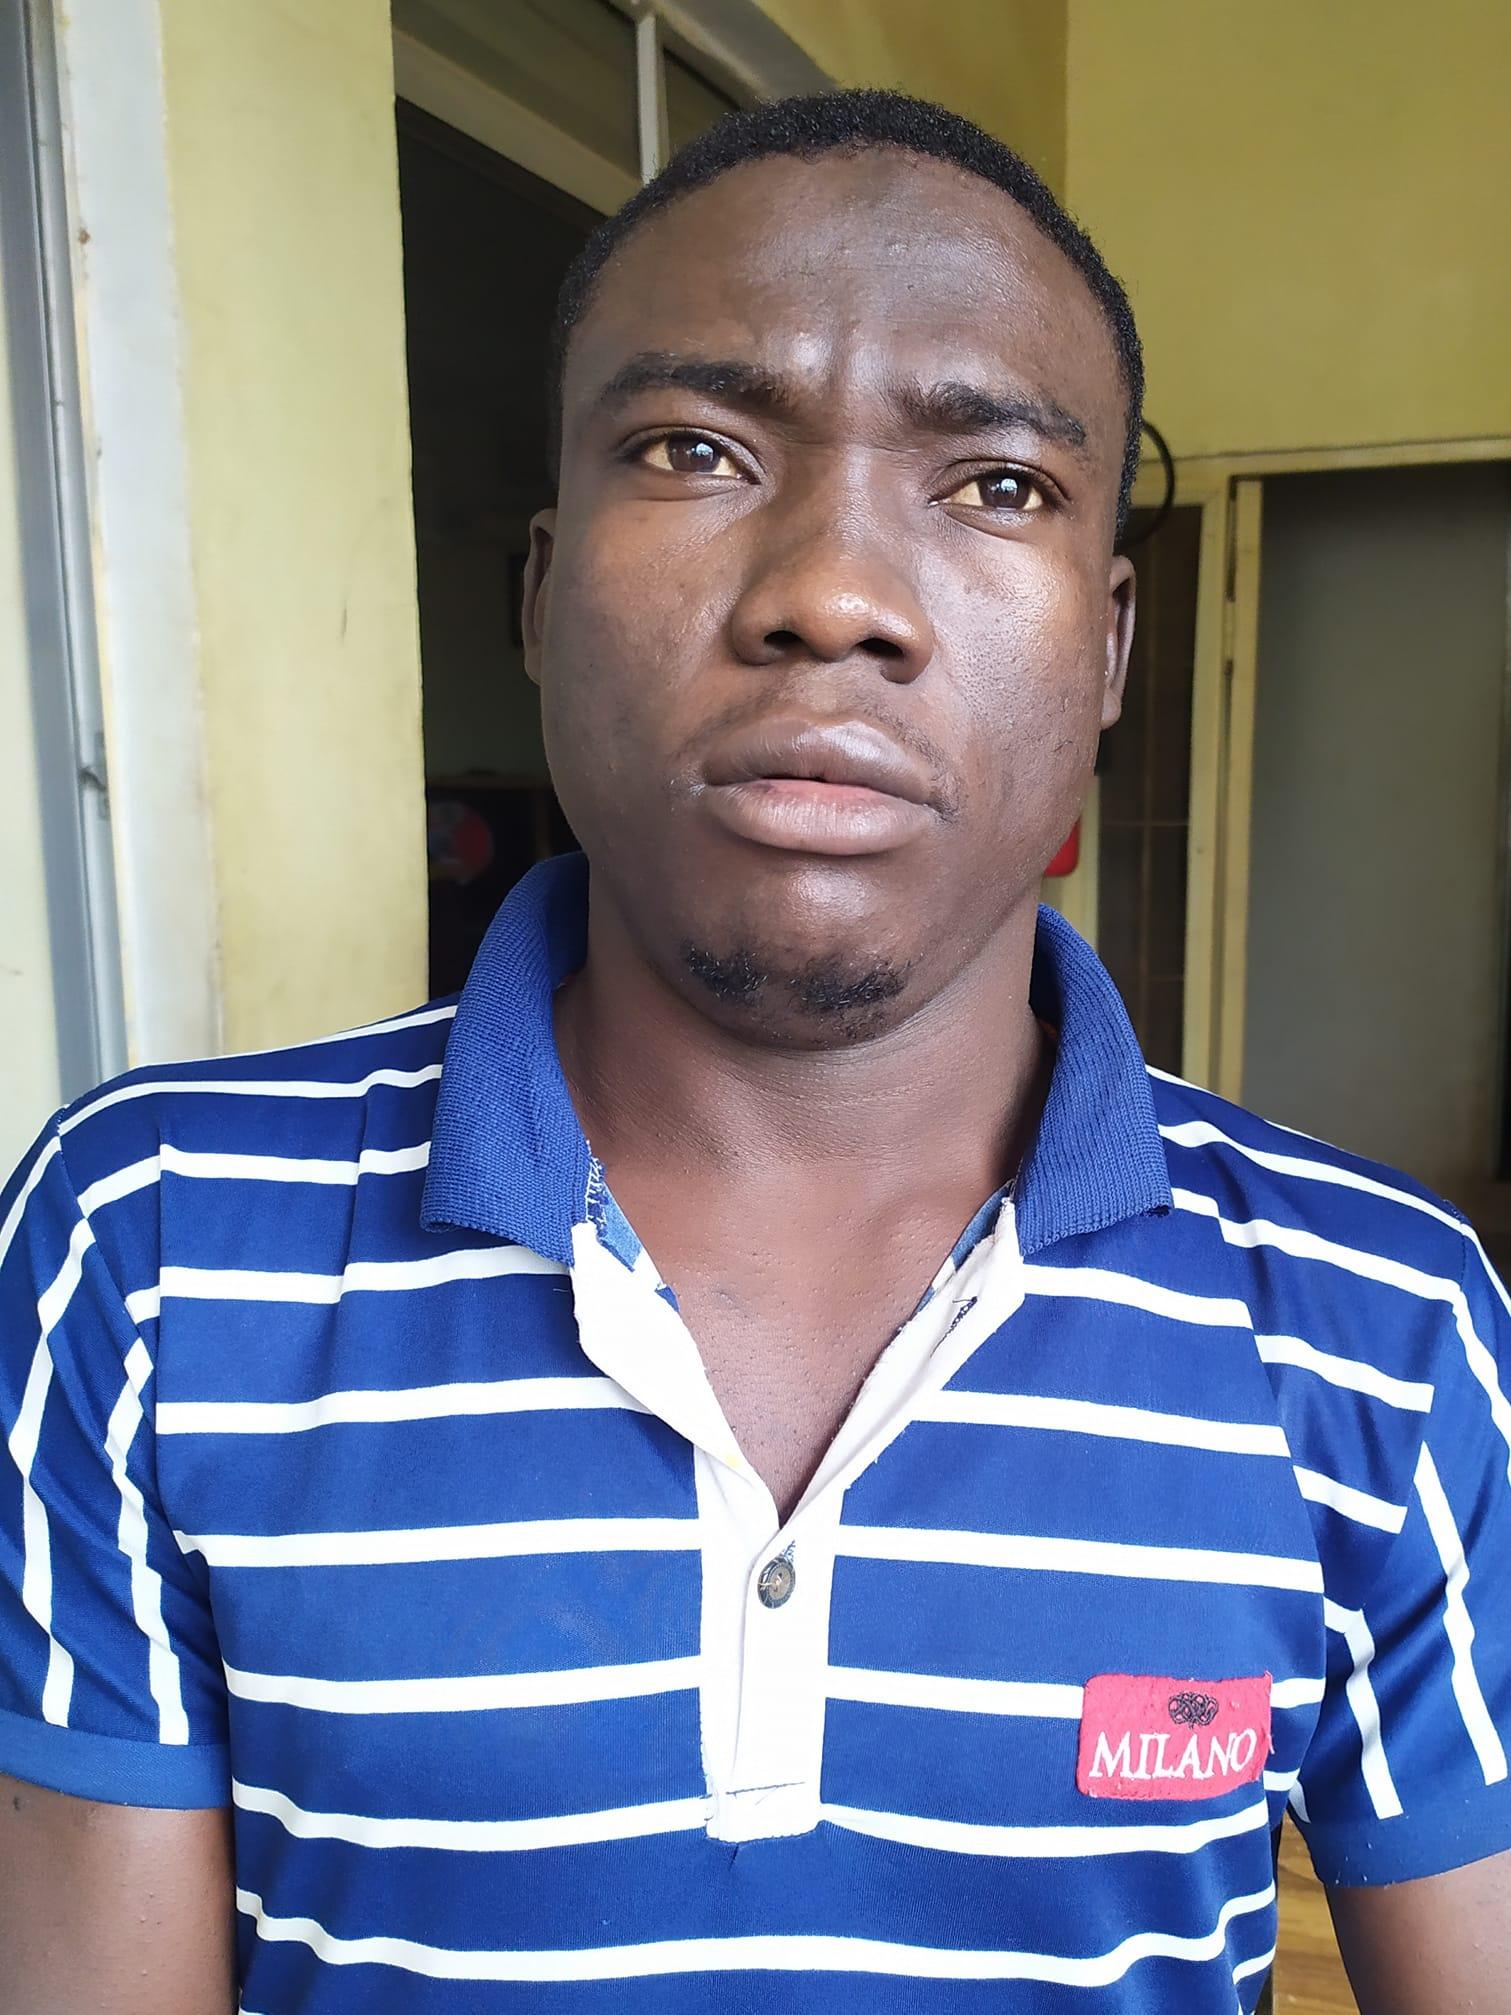 Adamu Aliyu ATM fraudster